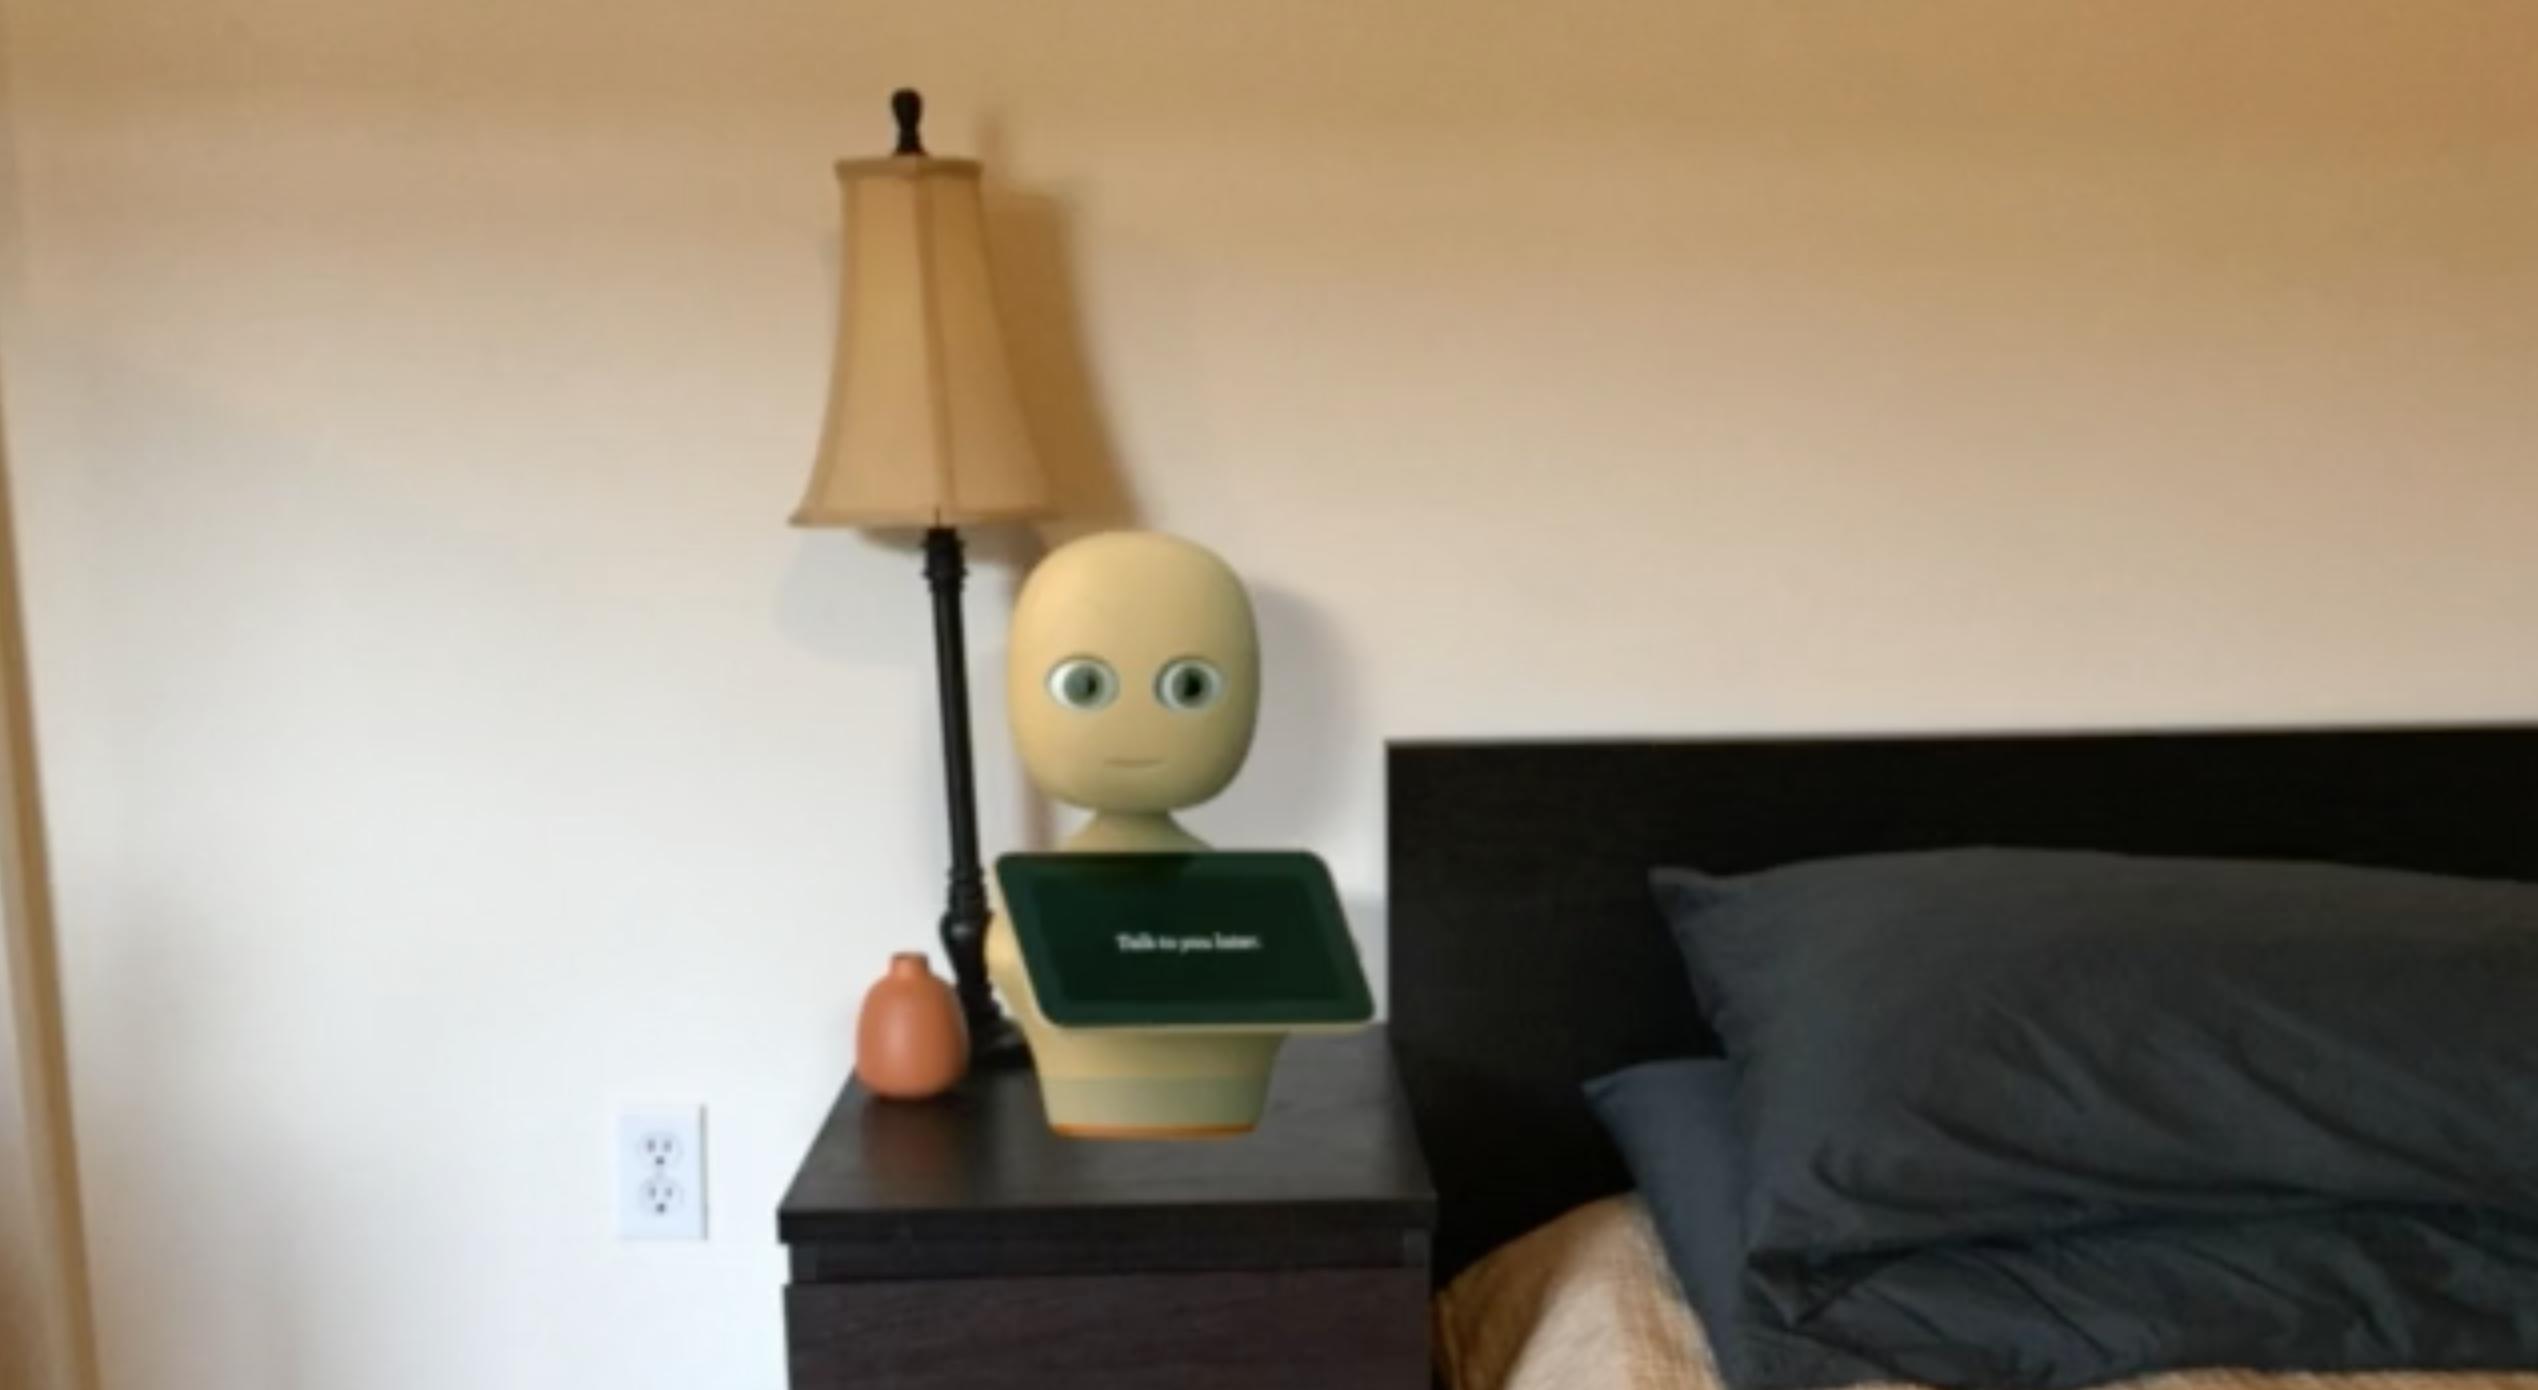 emotion recognition SDK for social robotics